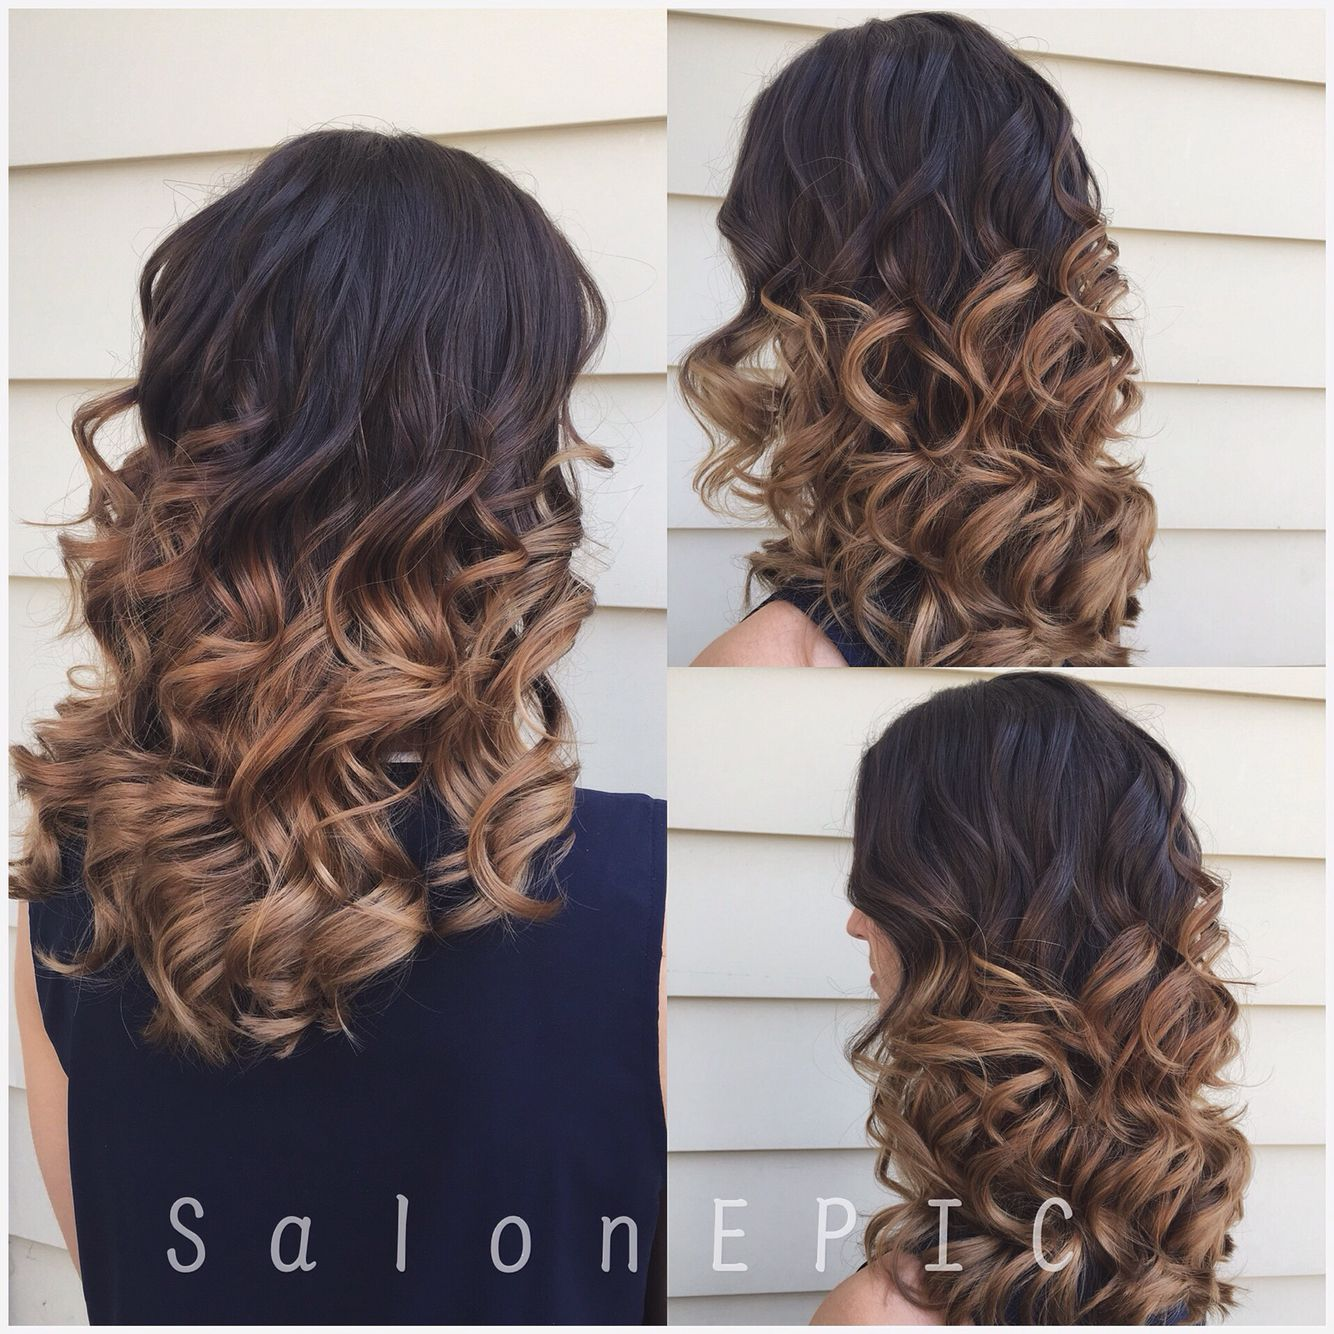 salon epic, branford ct- lindsay | hair ideas | hair styles